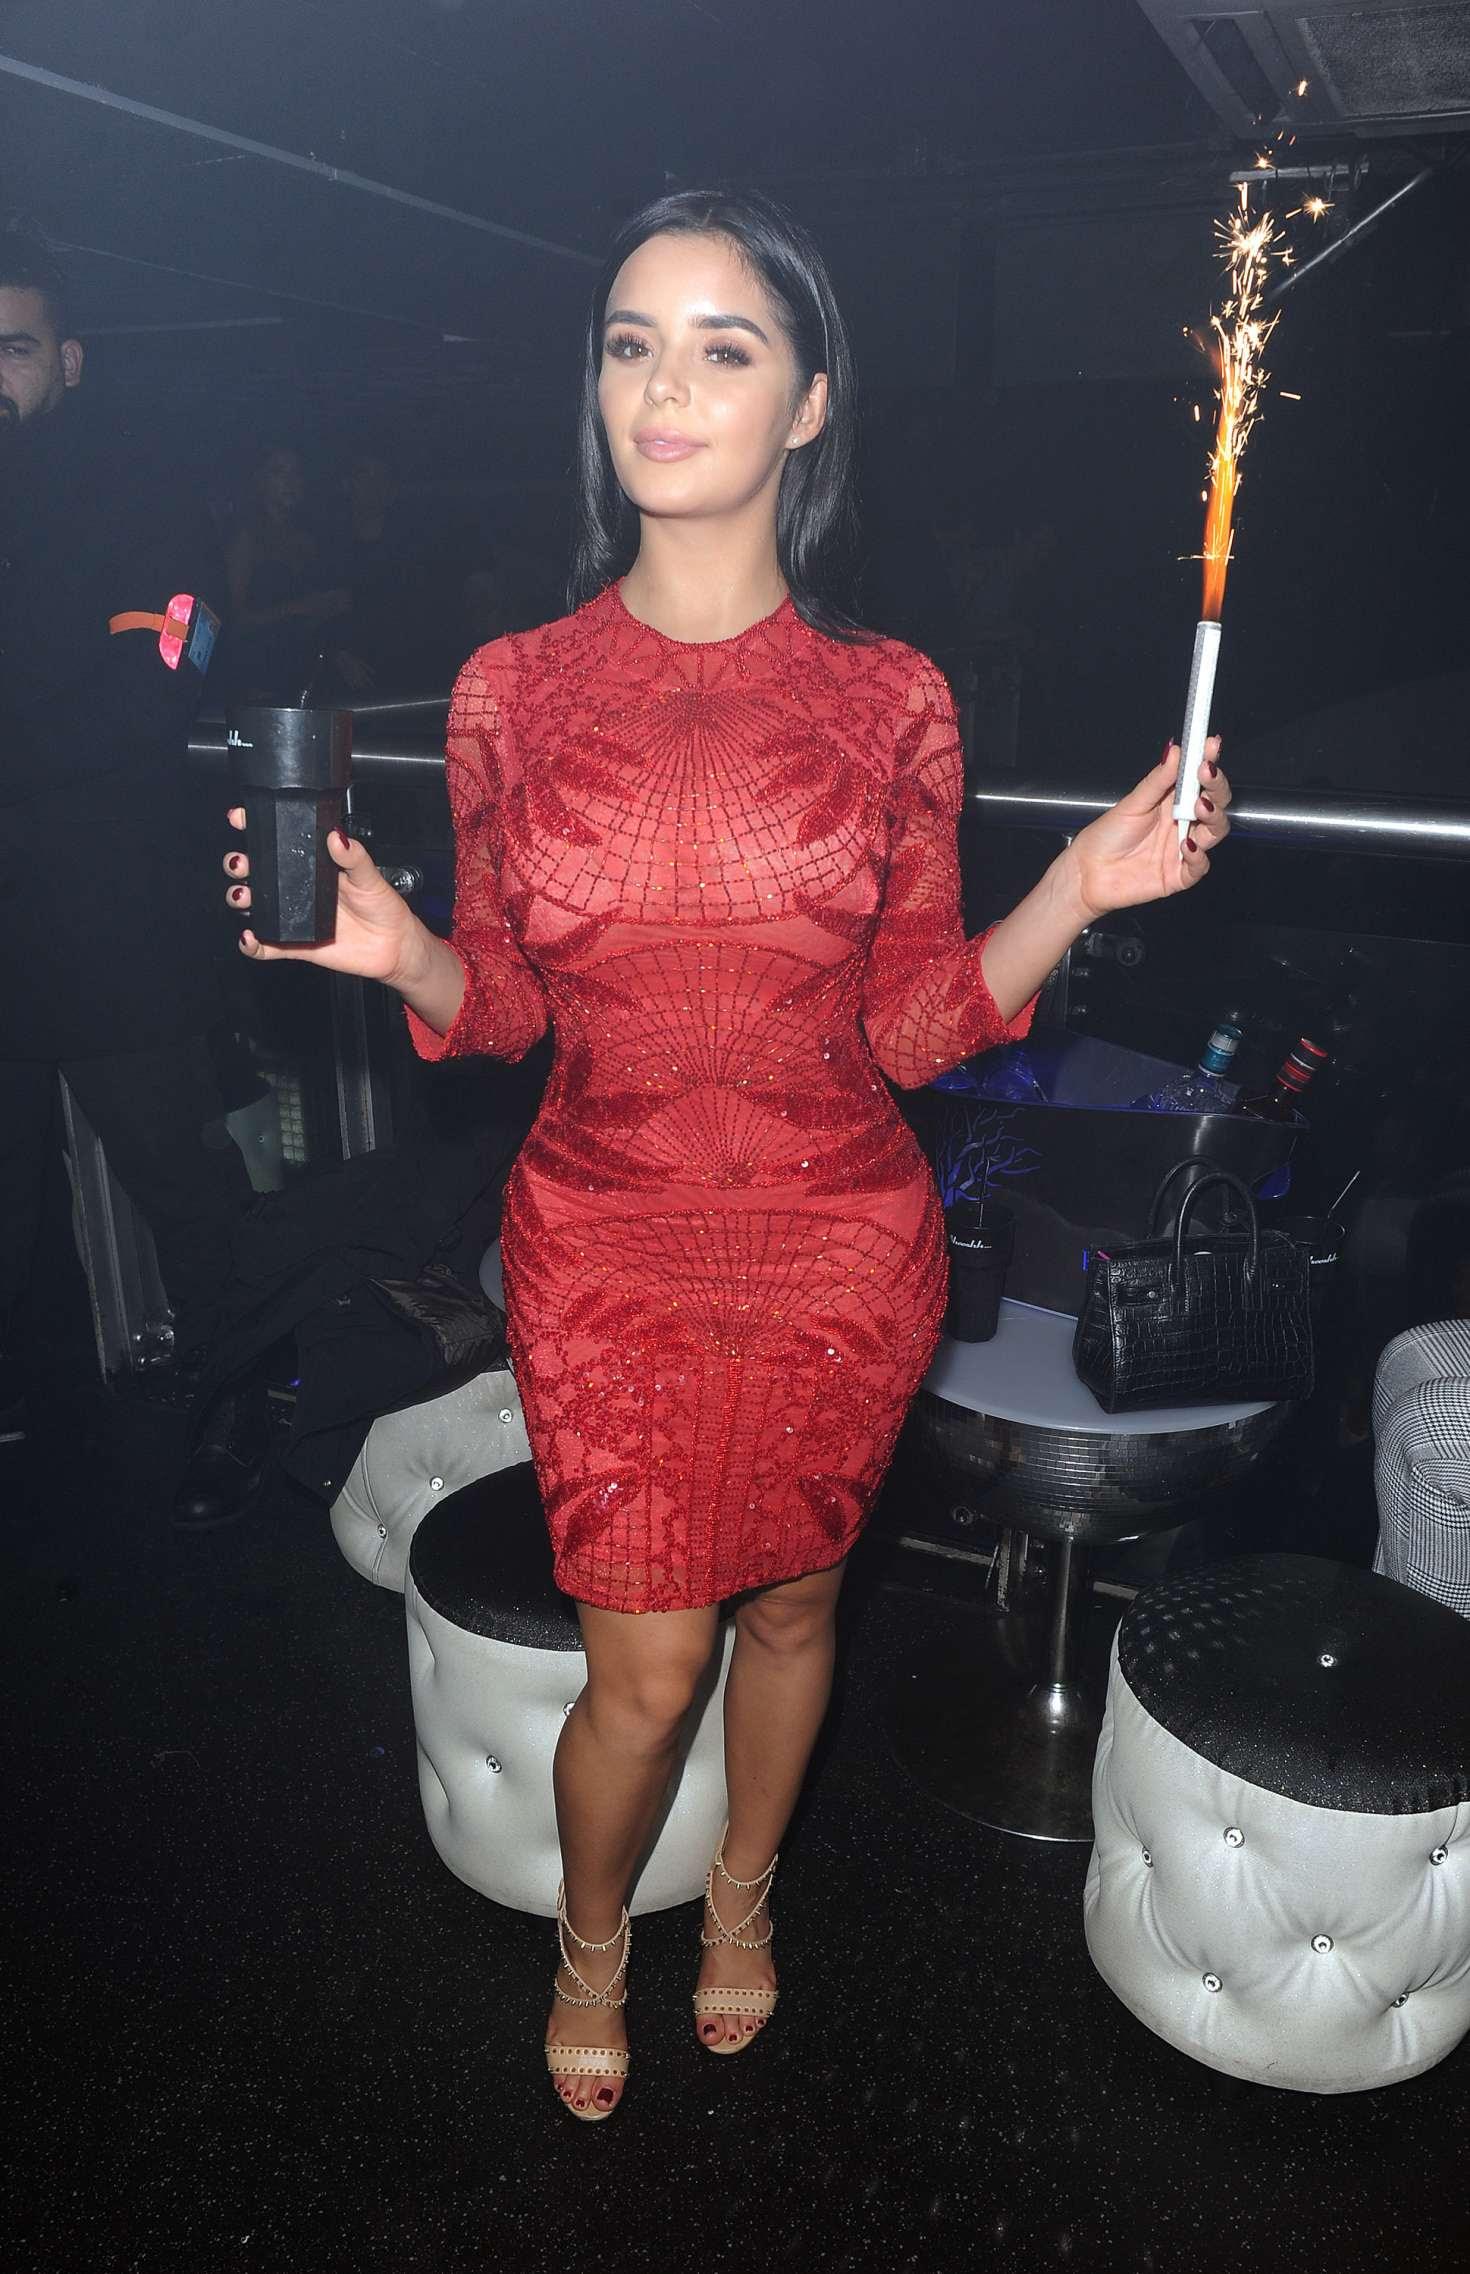 Demi Rose in Red Dress at Shooshh nightclub in Brighton